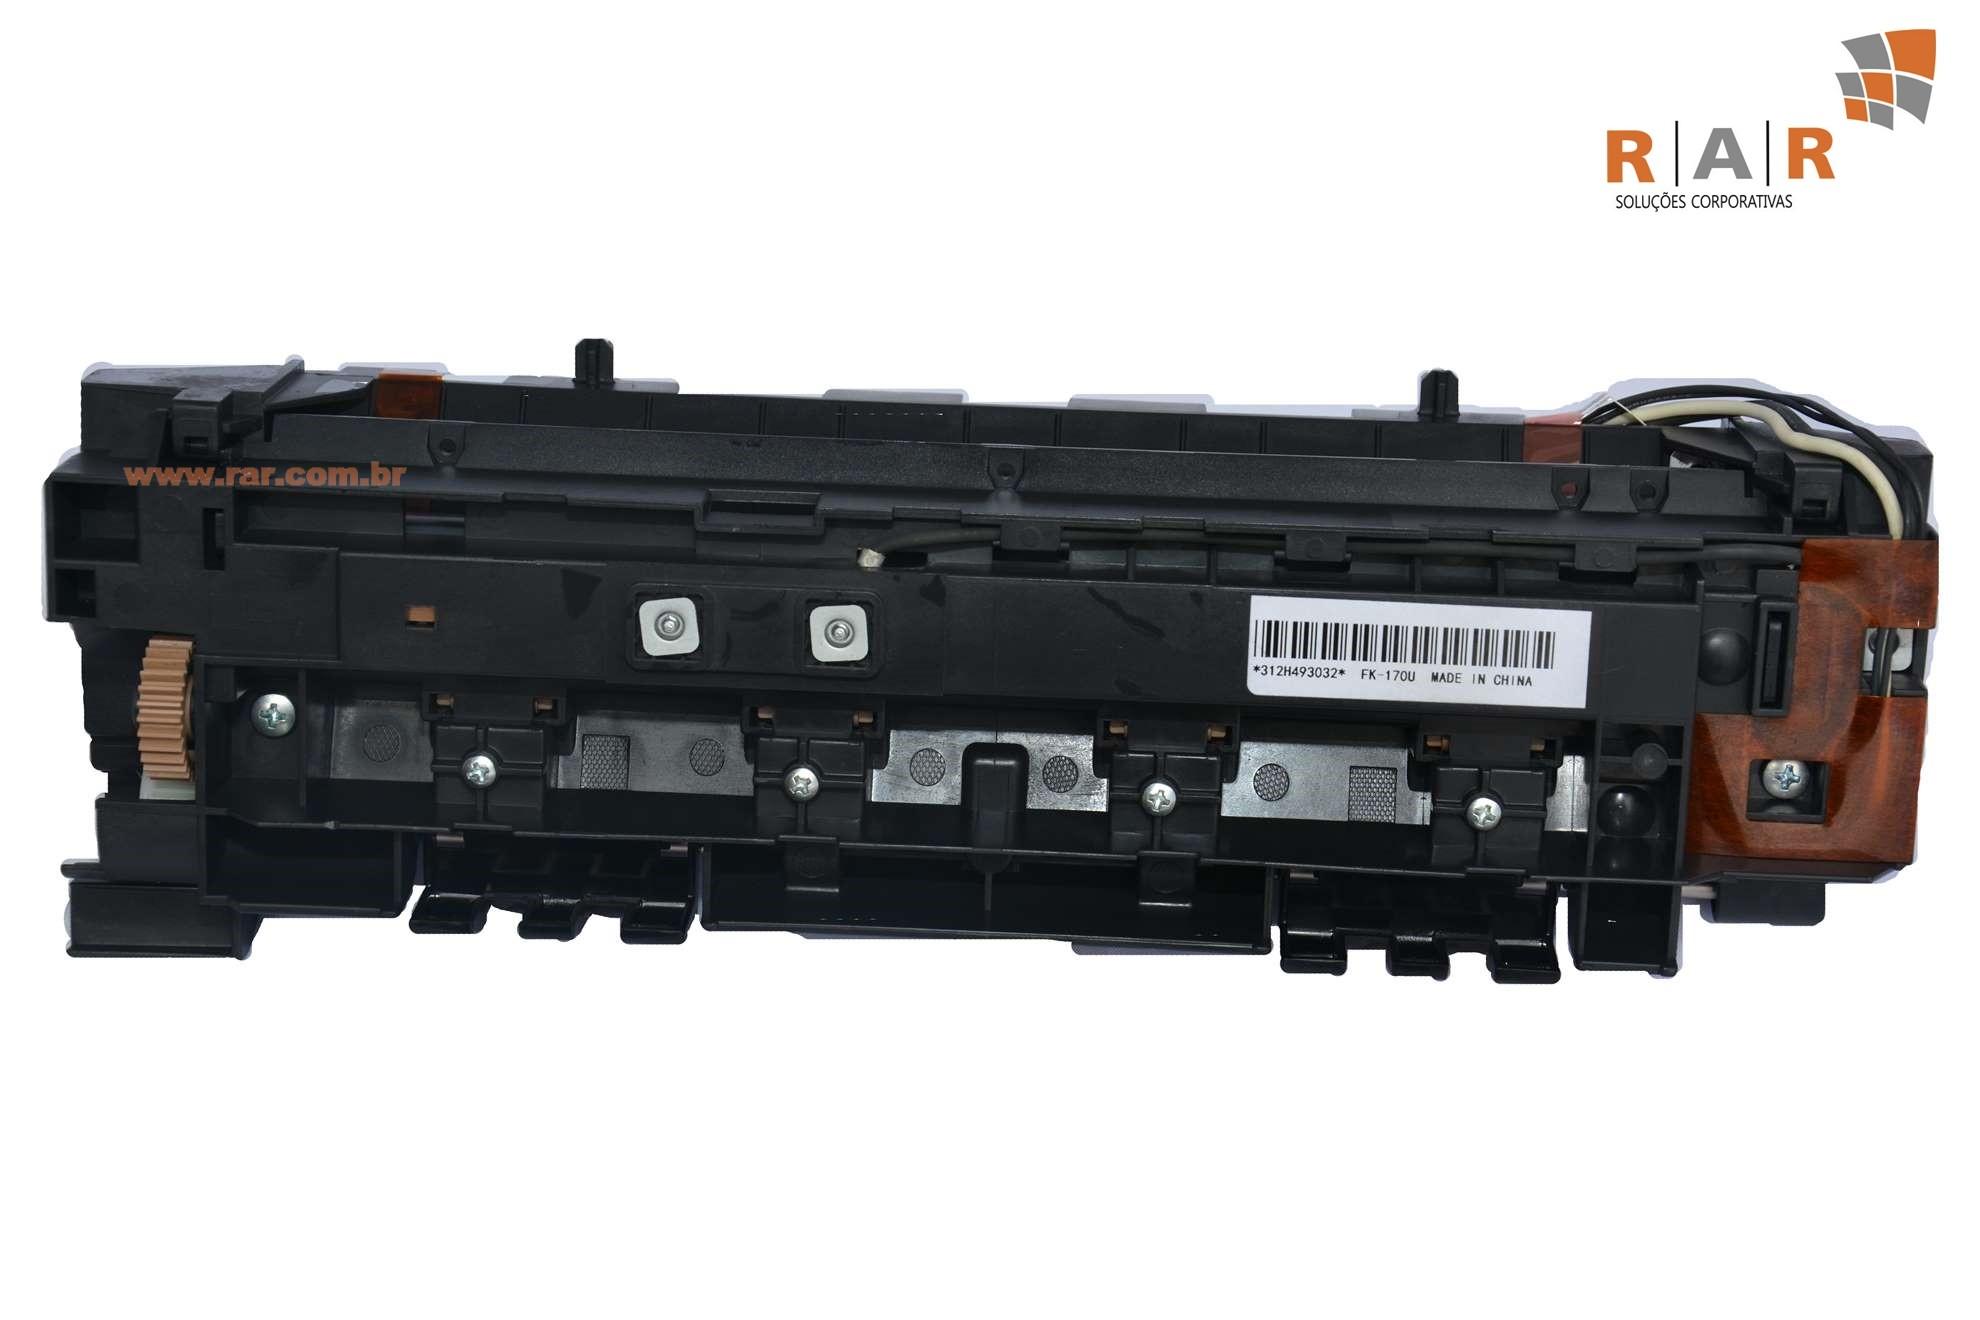 FK170U / FK-170U / 302LZ93050 / 302LV93136 /  FK171U / FK-171U UNIDADE FUSOR COMPLETO ORIGINAL PARA KYOCERA ECOSYS M2035DN / M2035 /FS1035MFP E SERIES